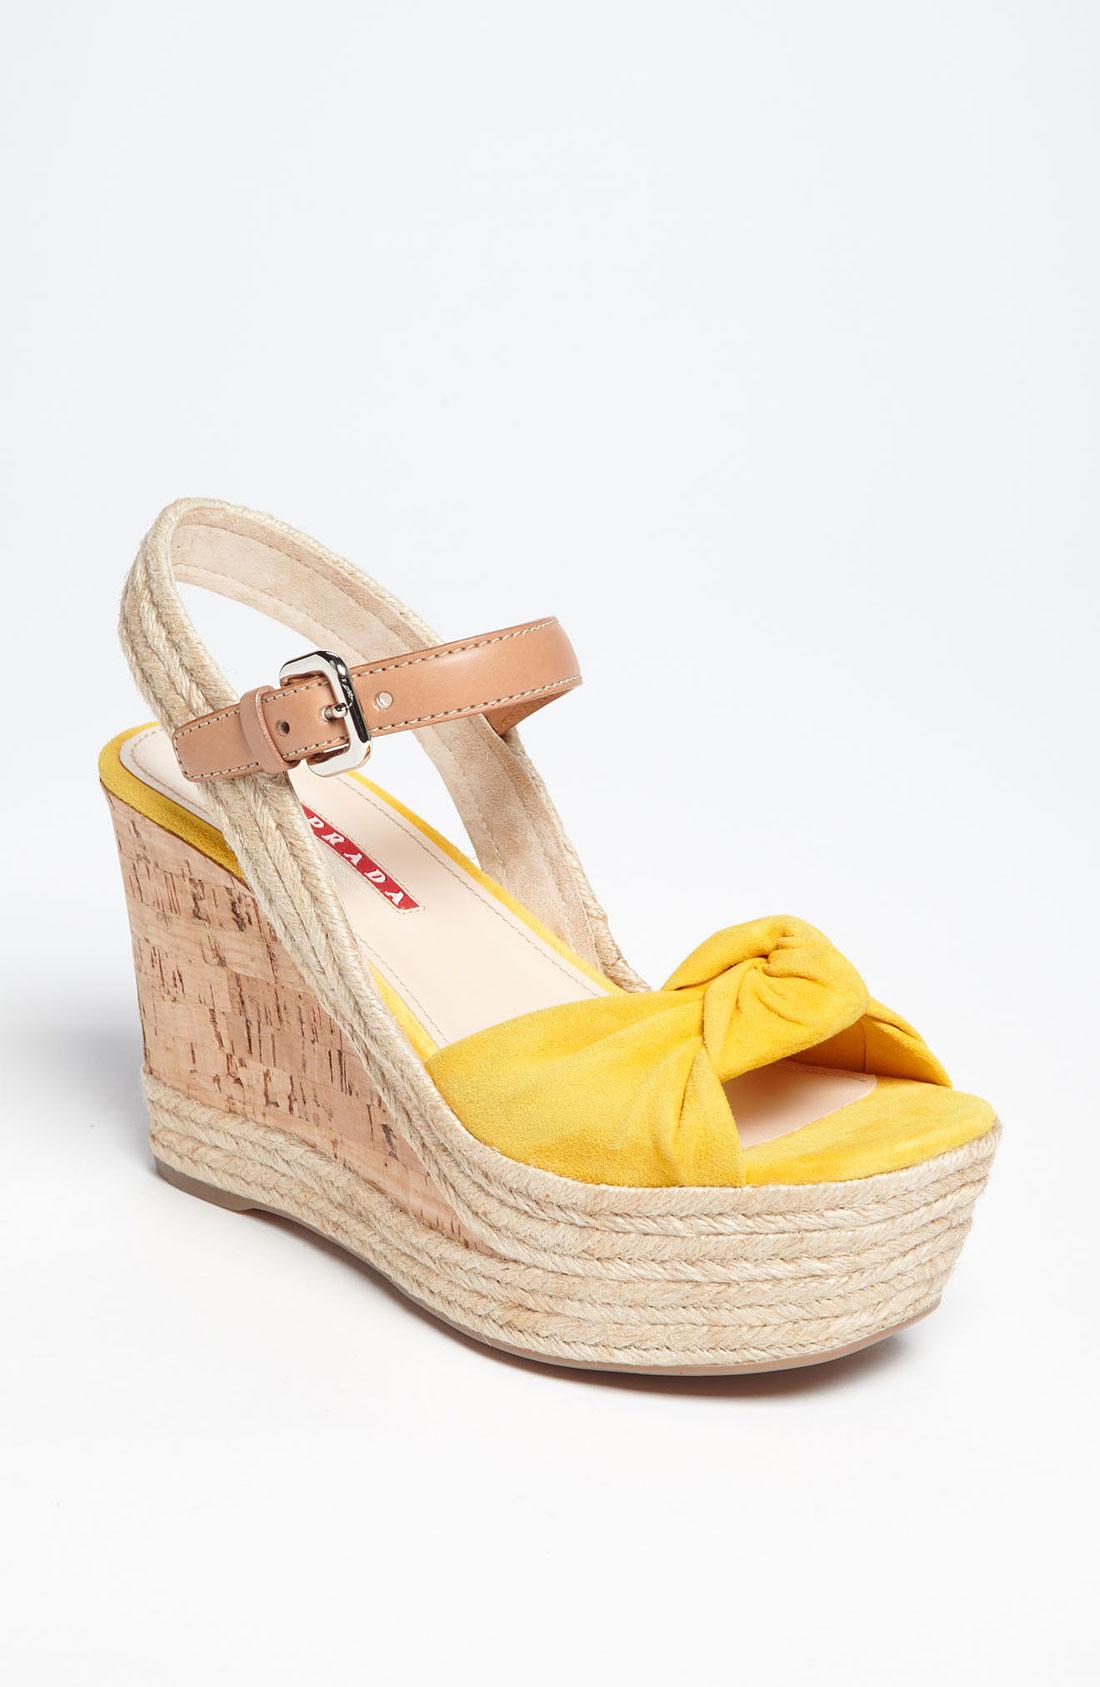 Prada Knot Wedge Sandal In Yellow